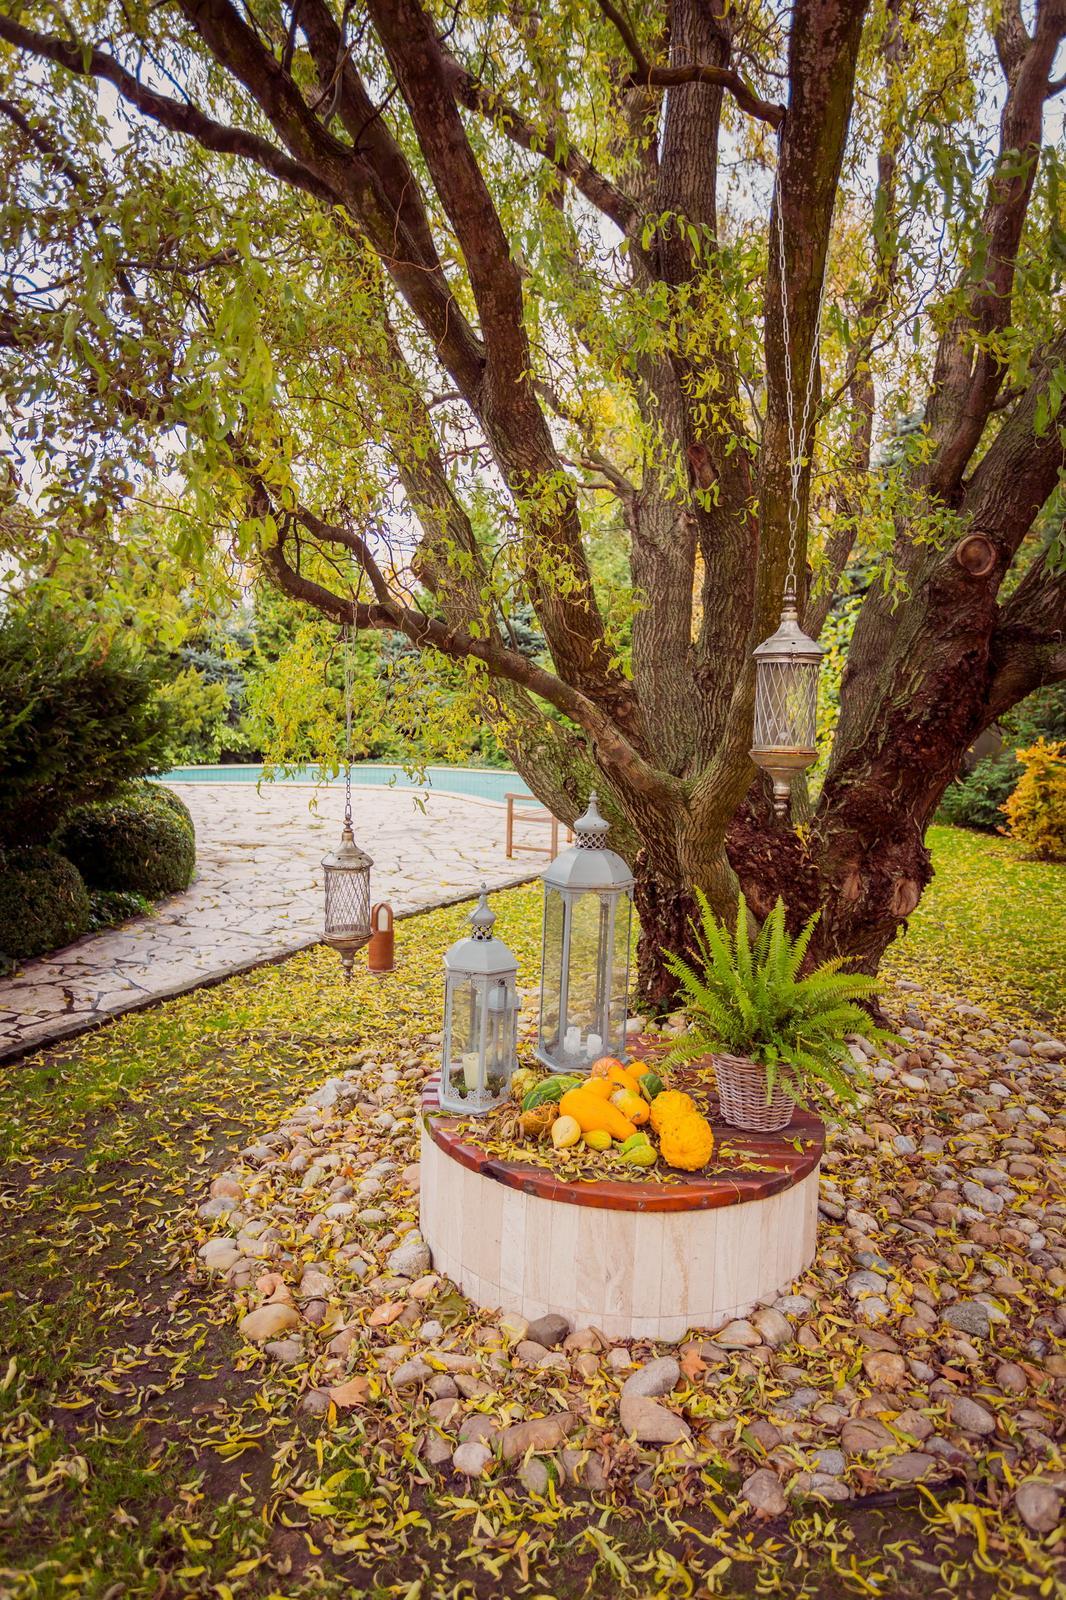 Krásna jeseň v Casteli - Foto:https://www.facebook.com/marian.csano.photography?fref=ts. Priestory, catering, výzdoba, svadobná torta, candy bar: www.castel.sk